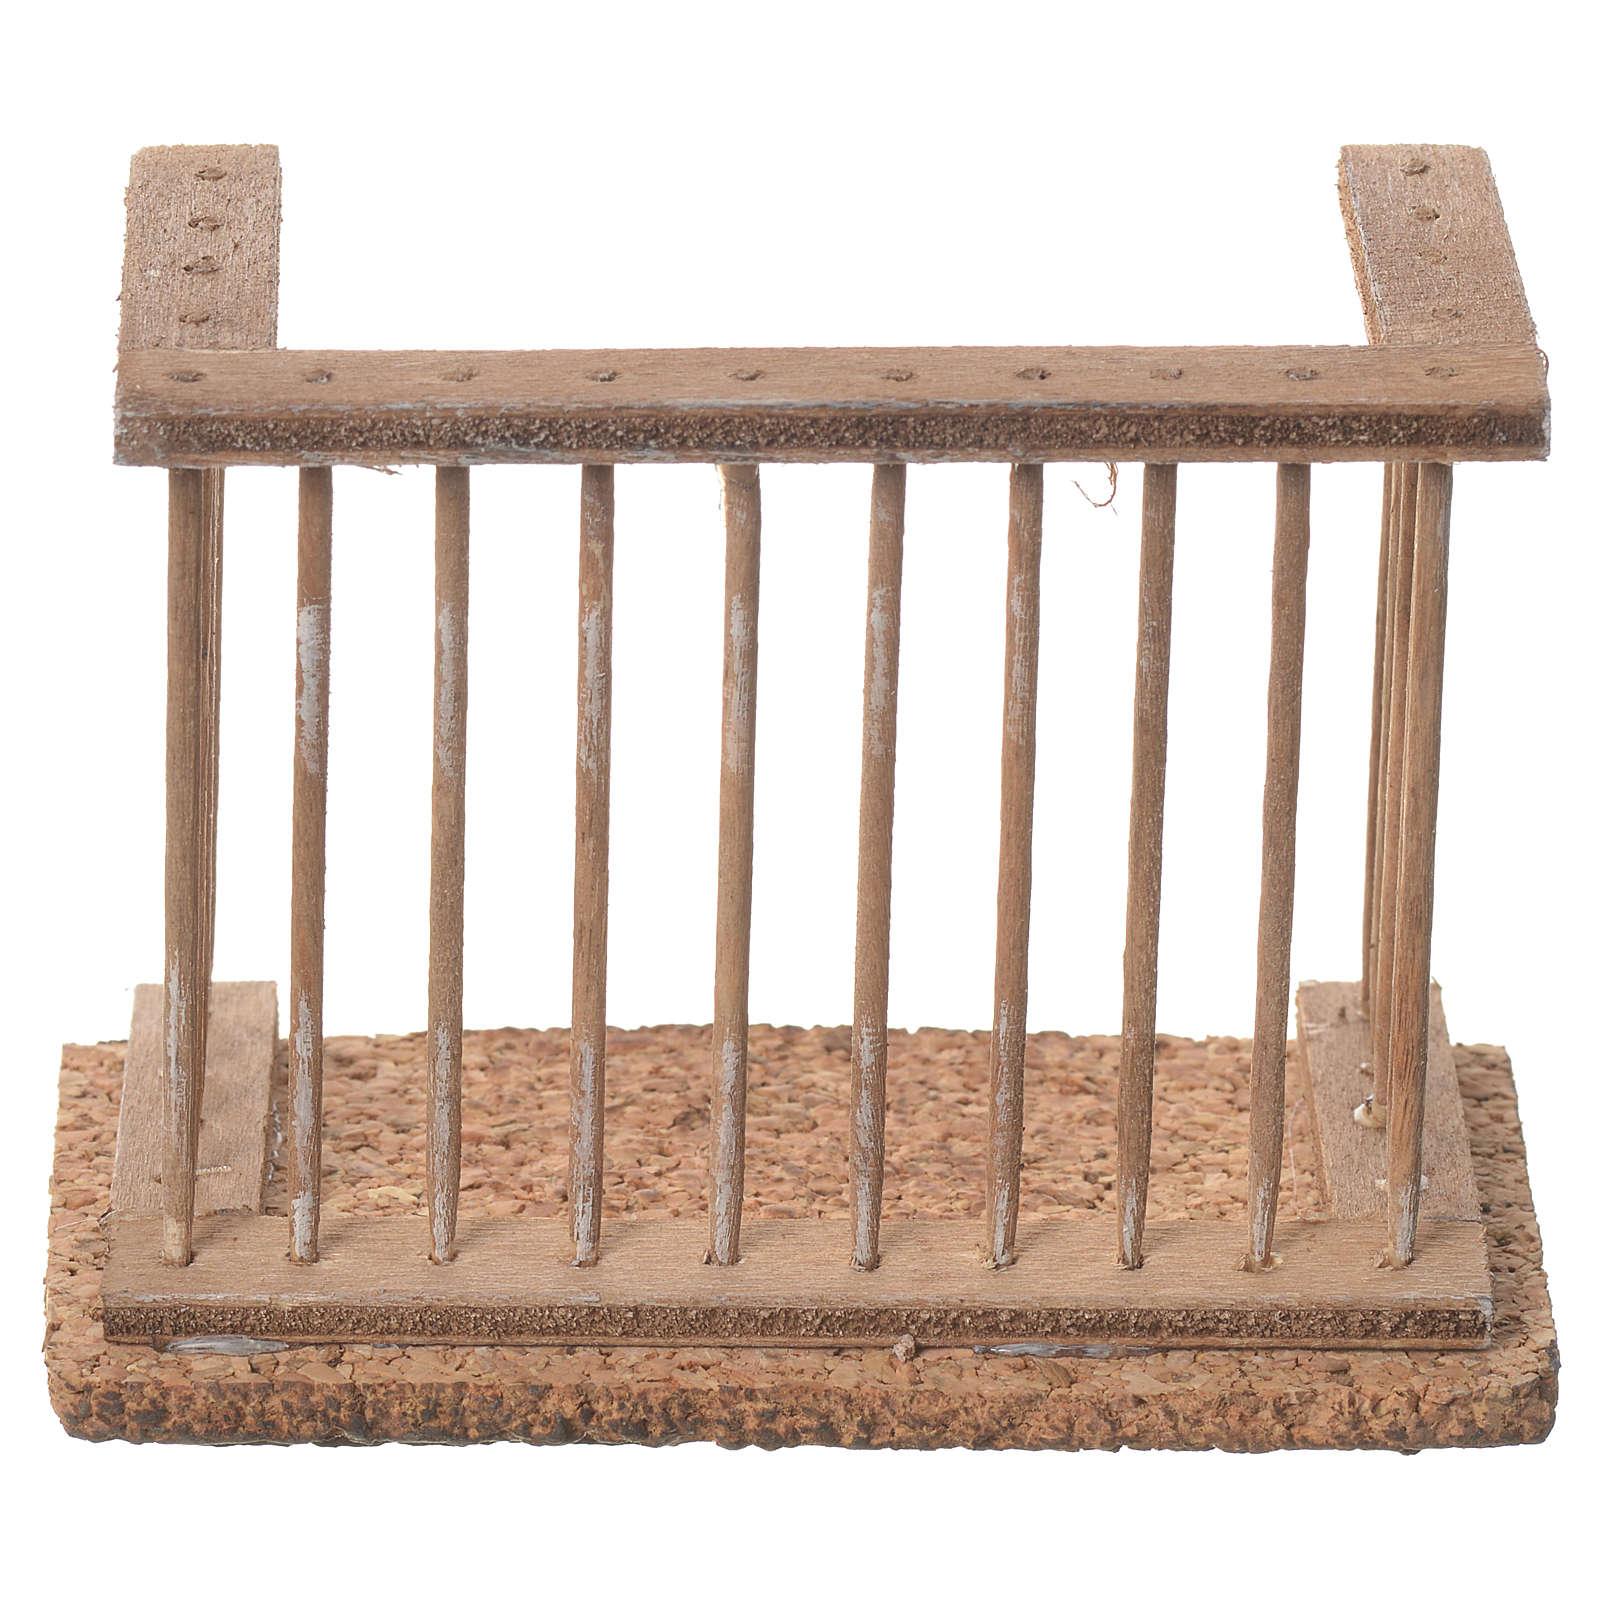 Balcone presepe napoletano 9x7x4 4